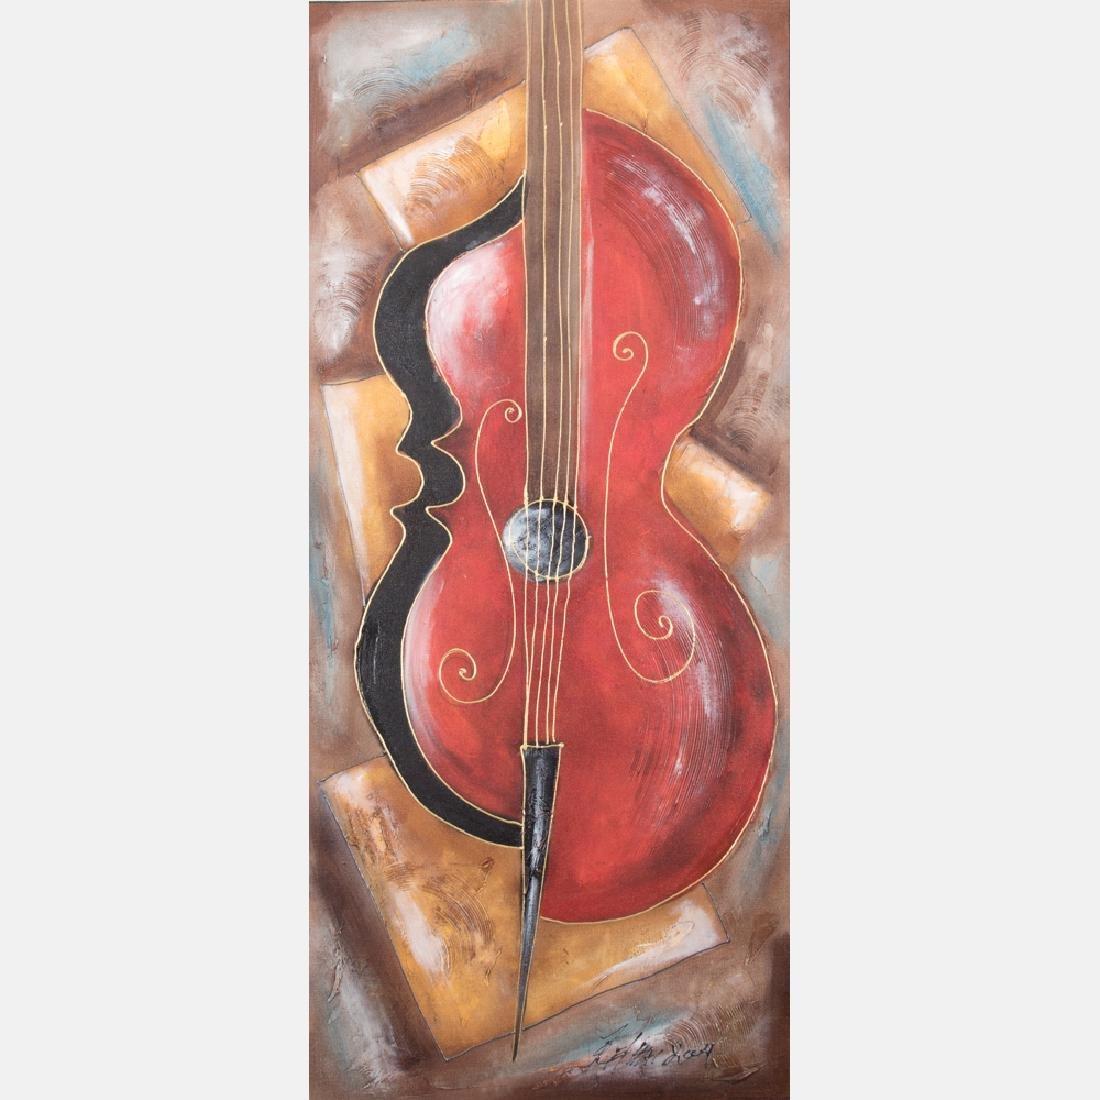 Oz El Hai (20th Century) The Solo Bass, Oil on canvas,